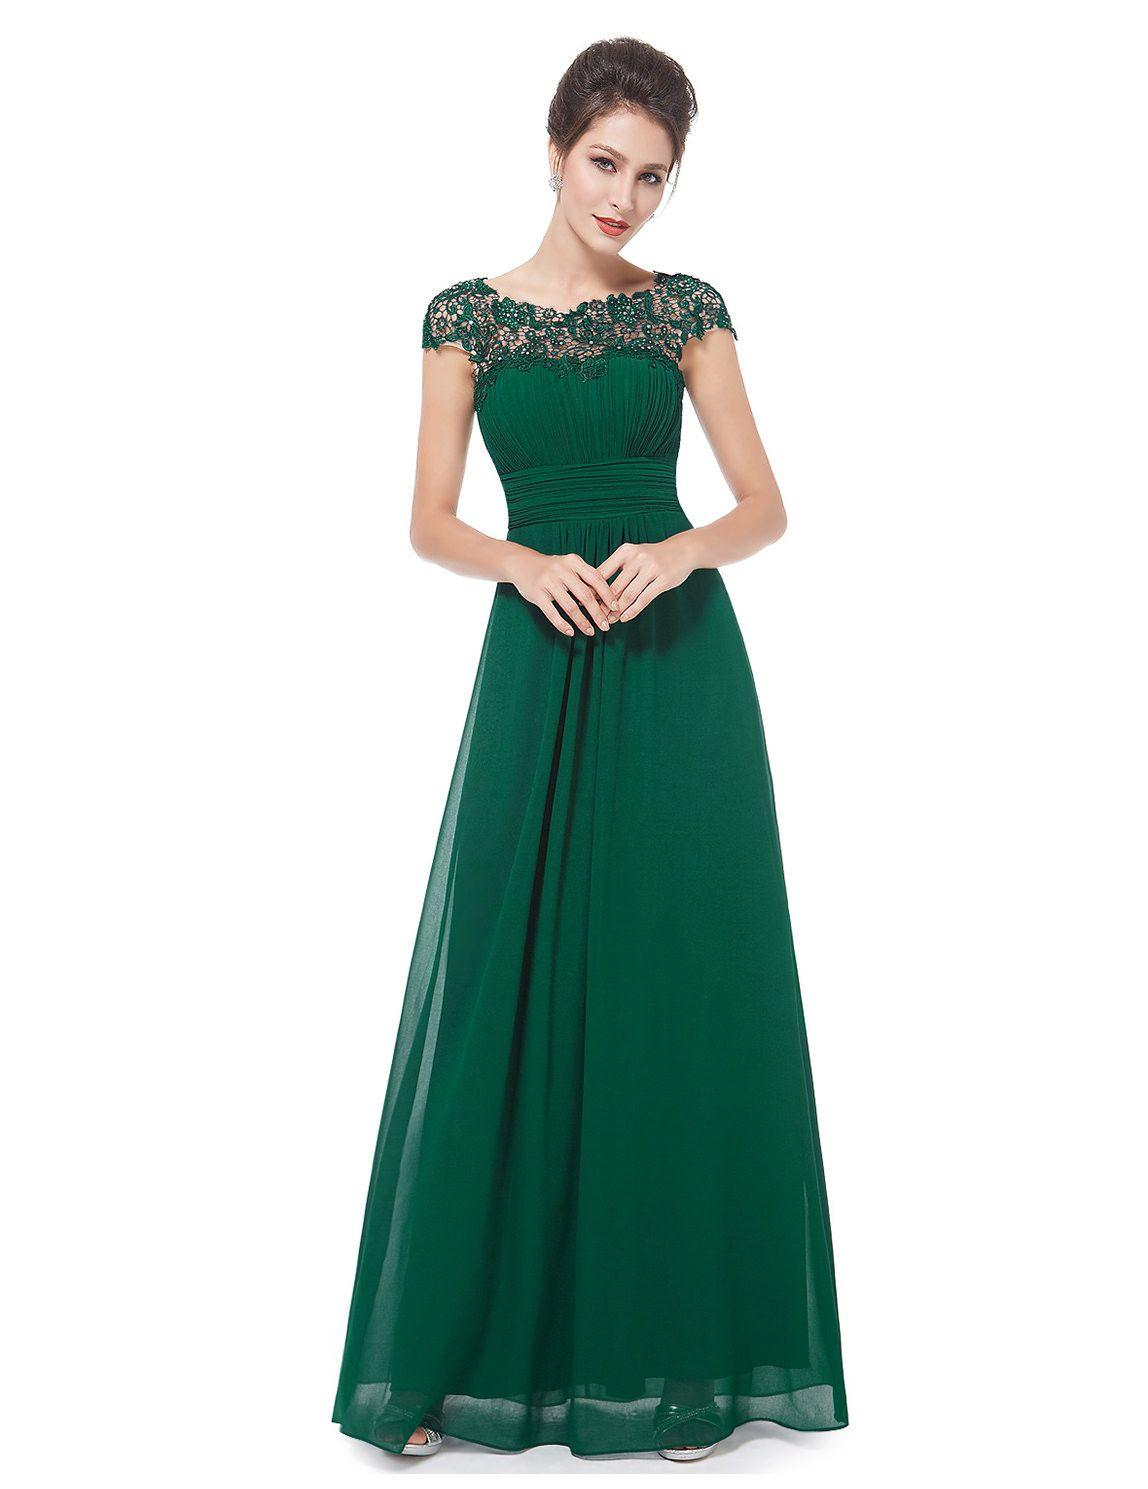 13 Coolste Abendkleid In Grün Lang DesignAbend Top Abendkleid In Grün Lang Vertrieb